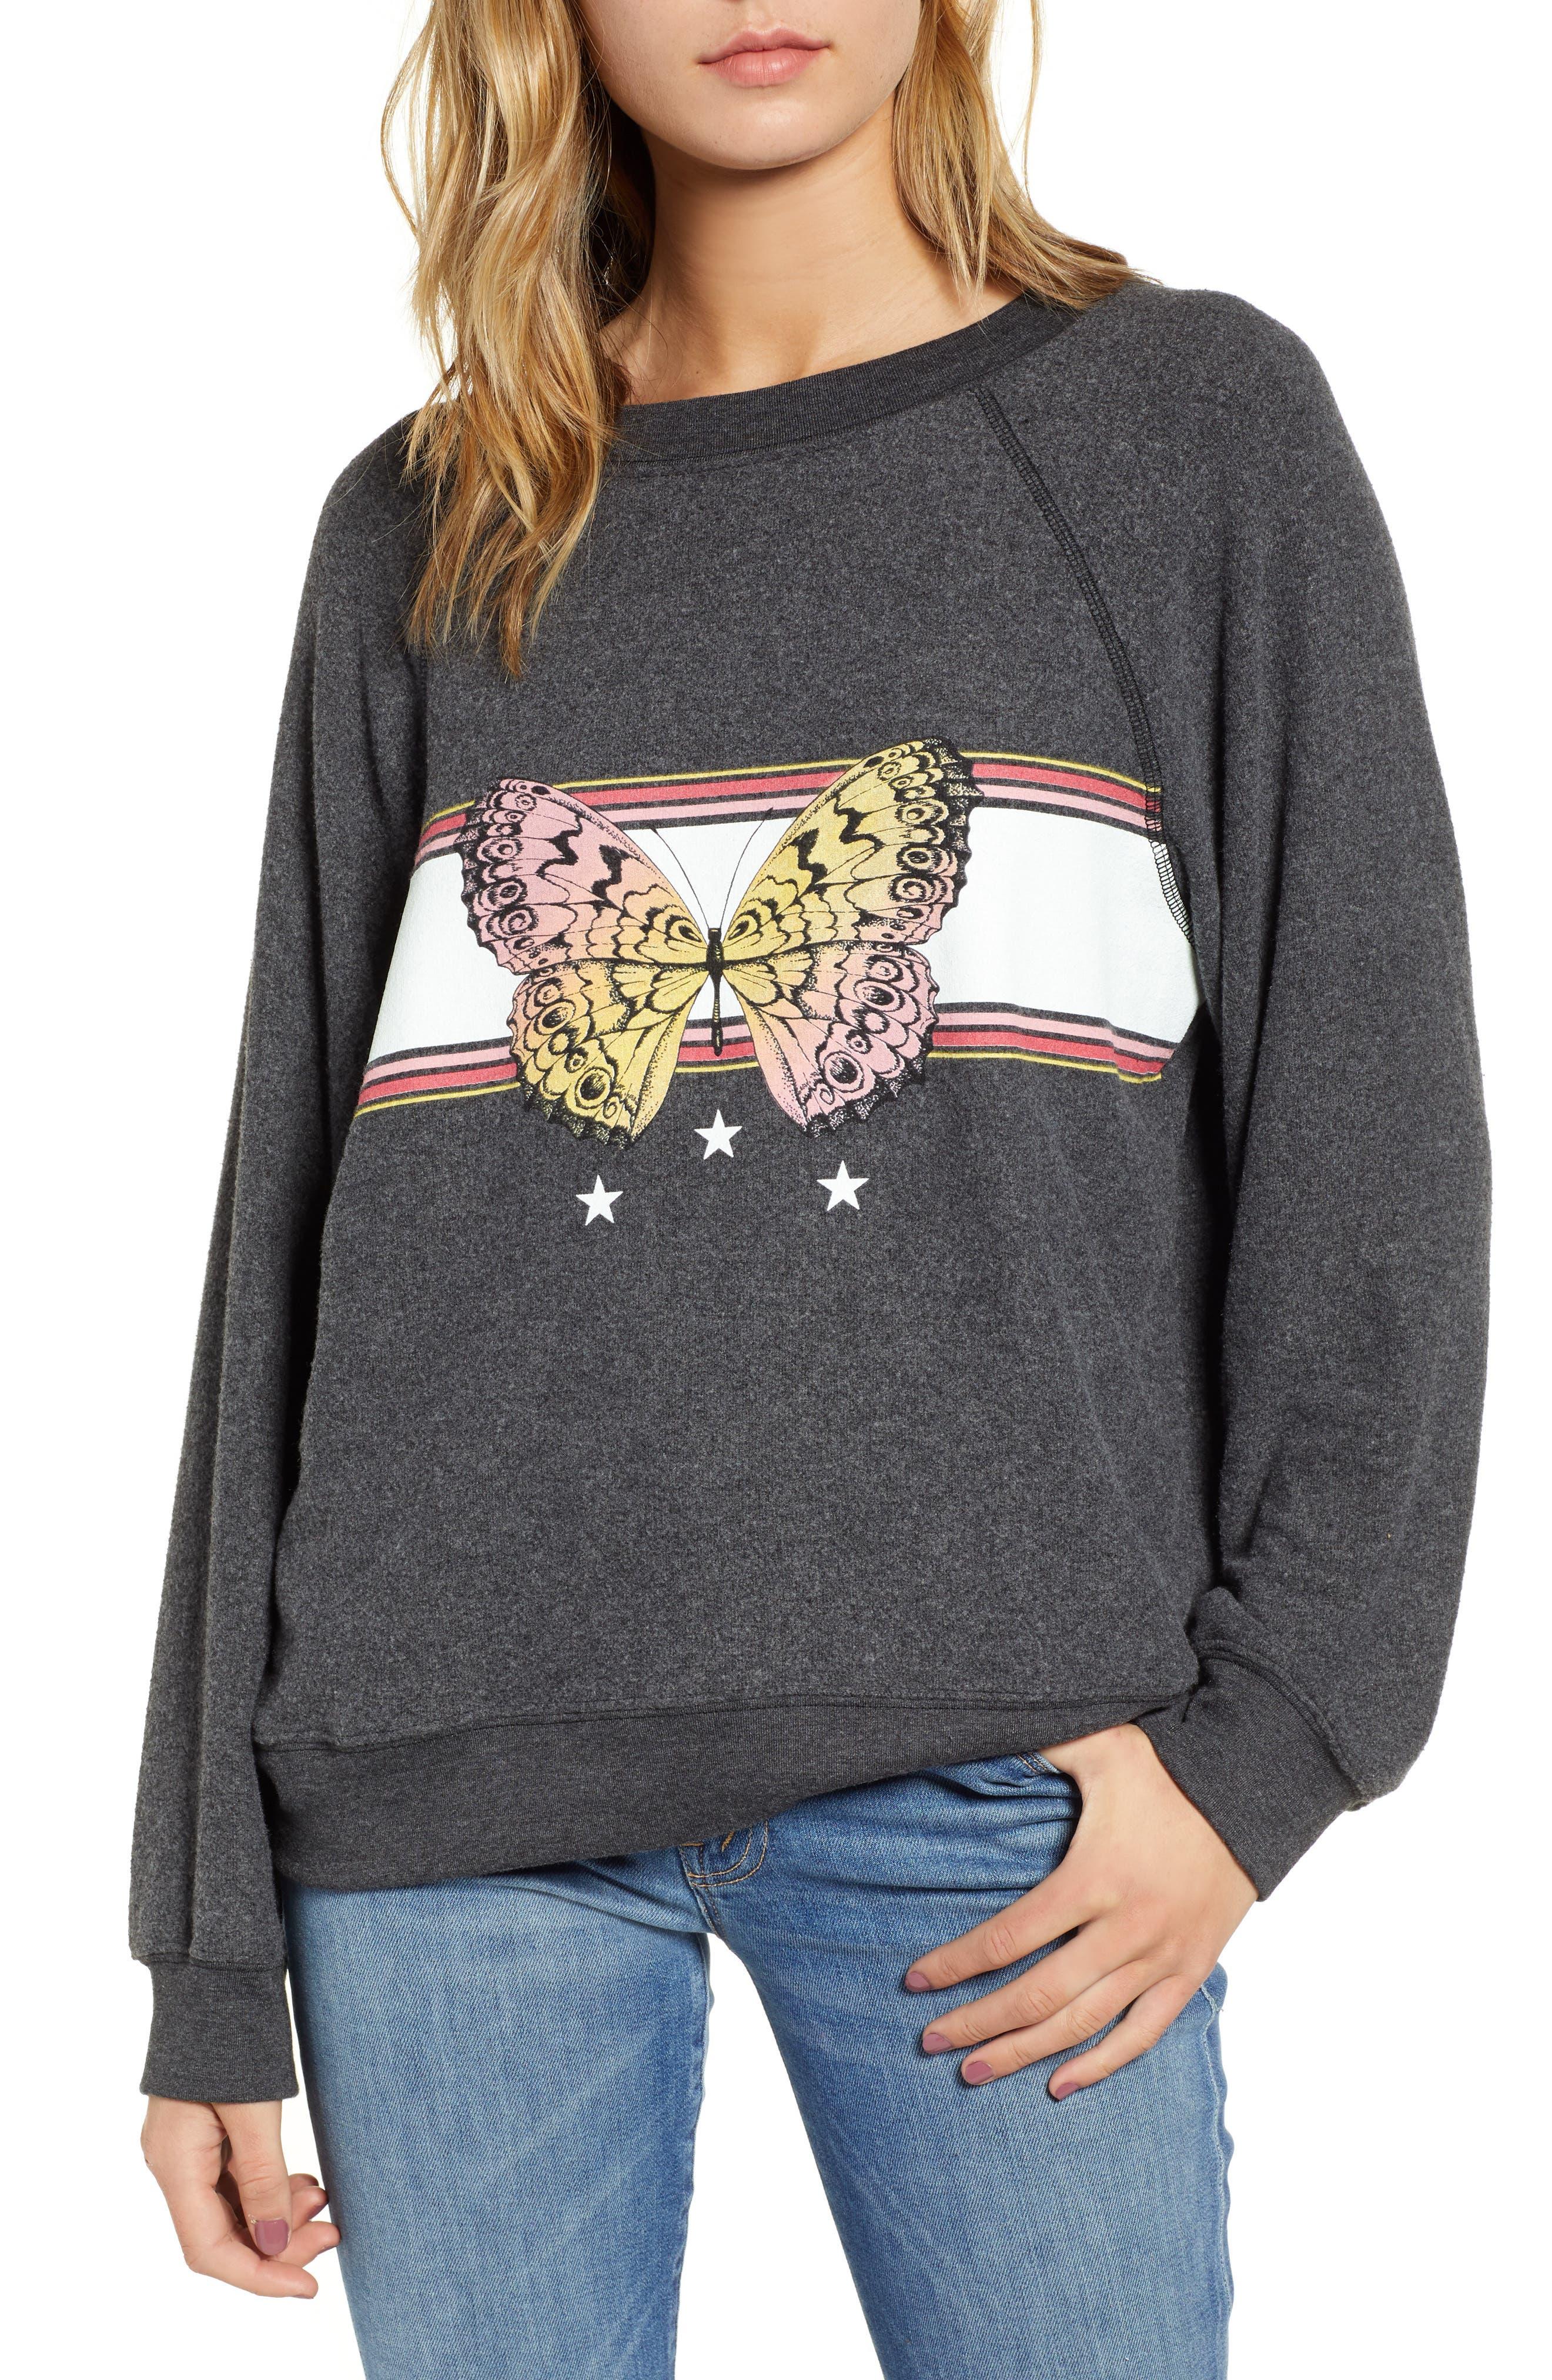 Sommers Papillion Sweatshirt,                             Main thumbnail 1, color,                             002